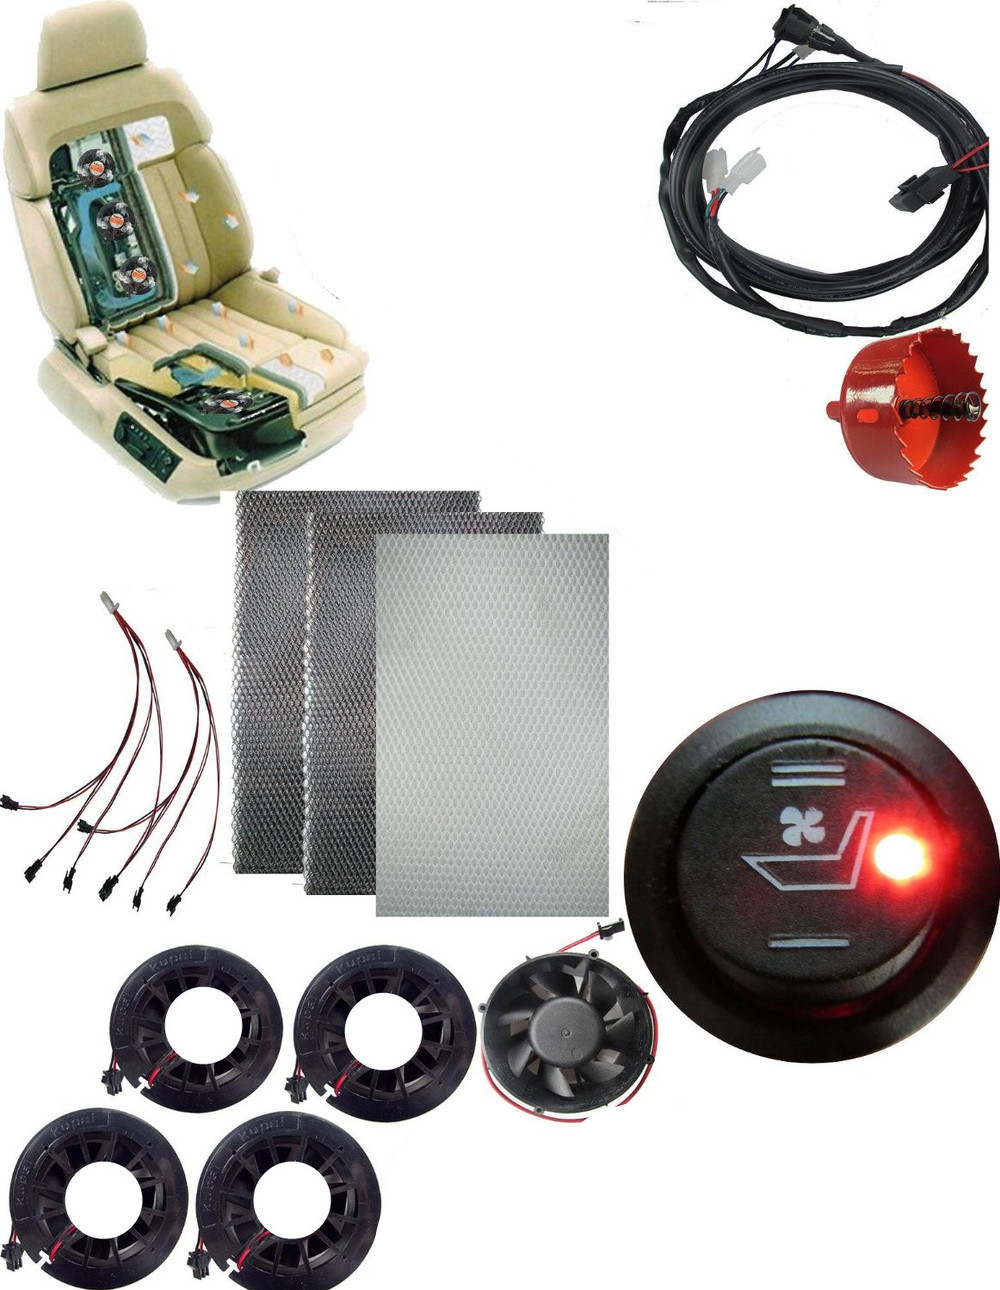 QINYI Yellow Turn Signal Function 12V Car DRL LED Daytime Running Light Fog Lamp For Hyundai